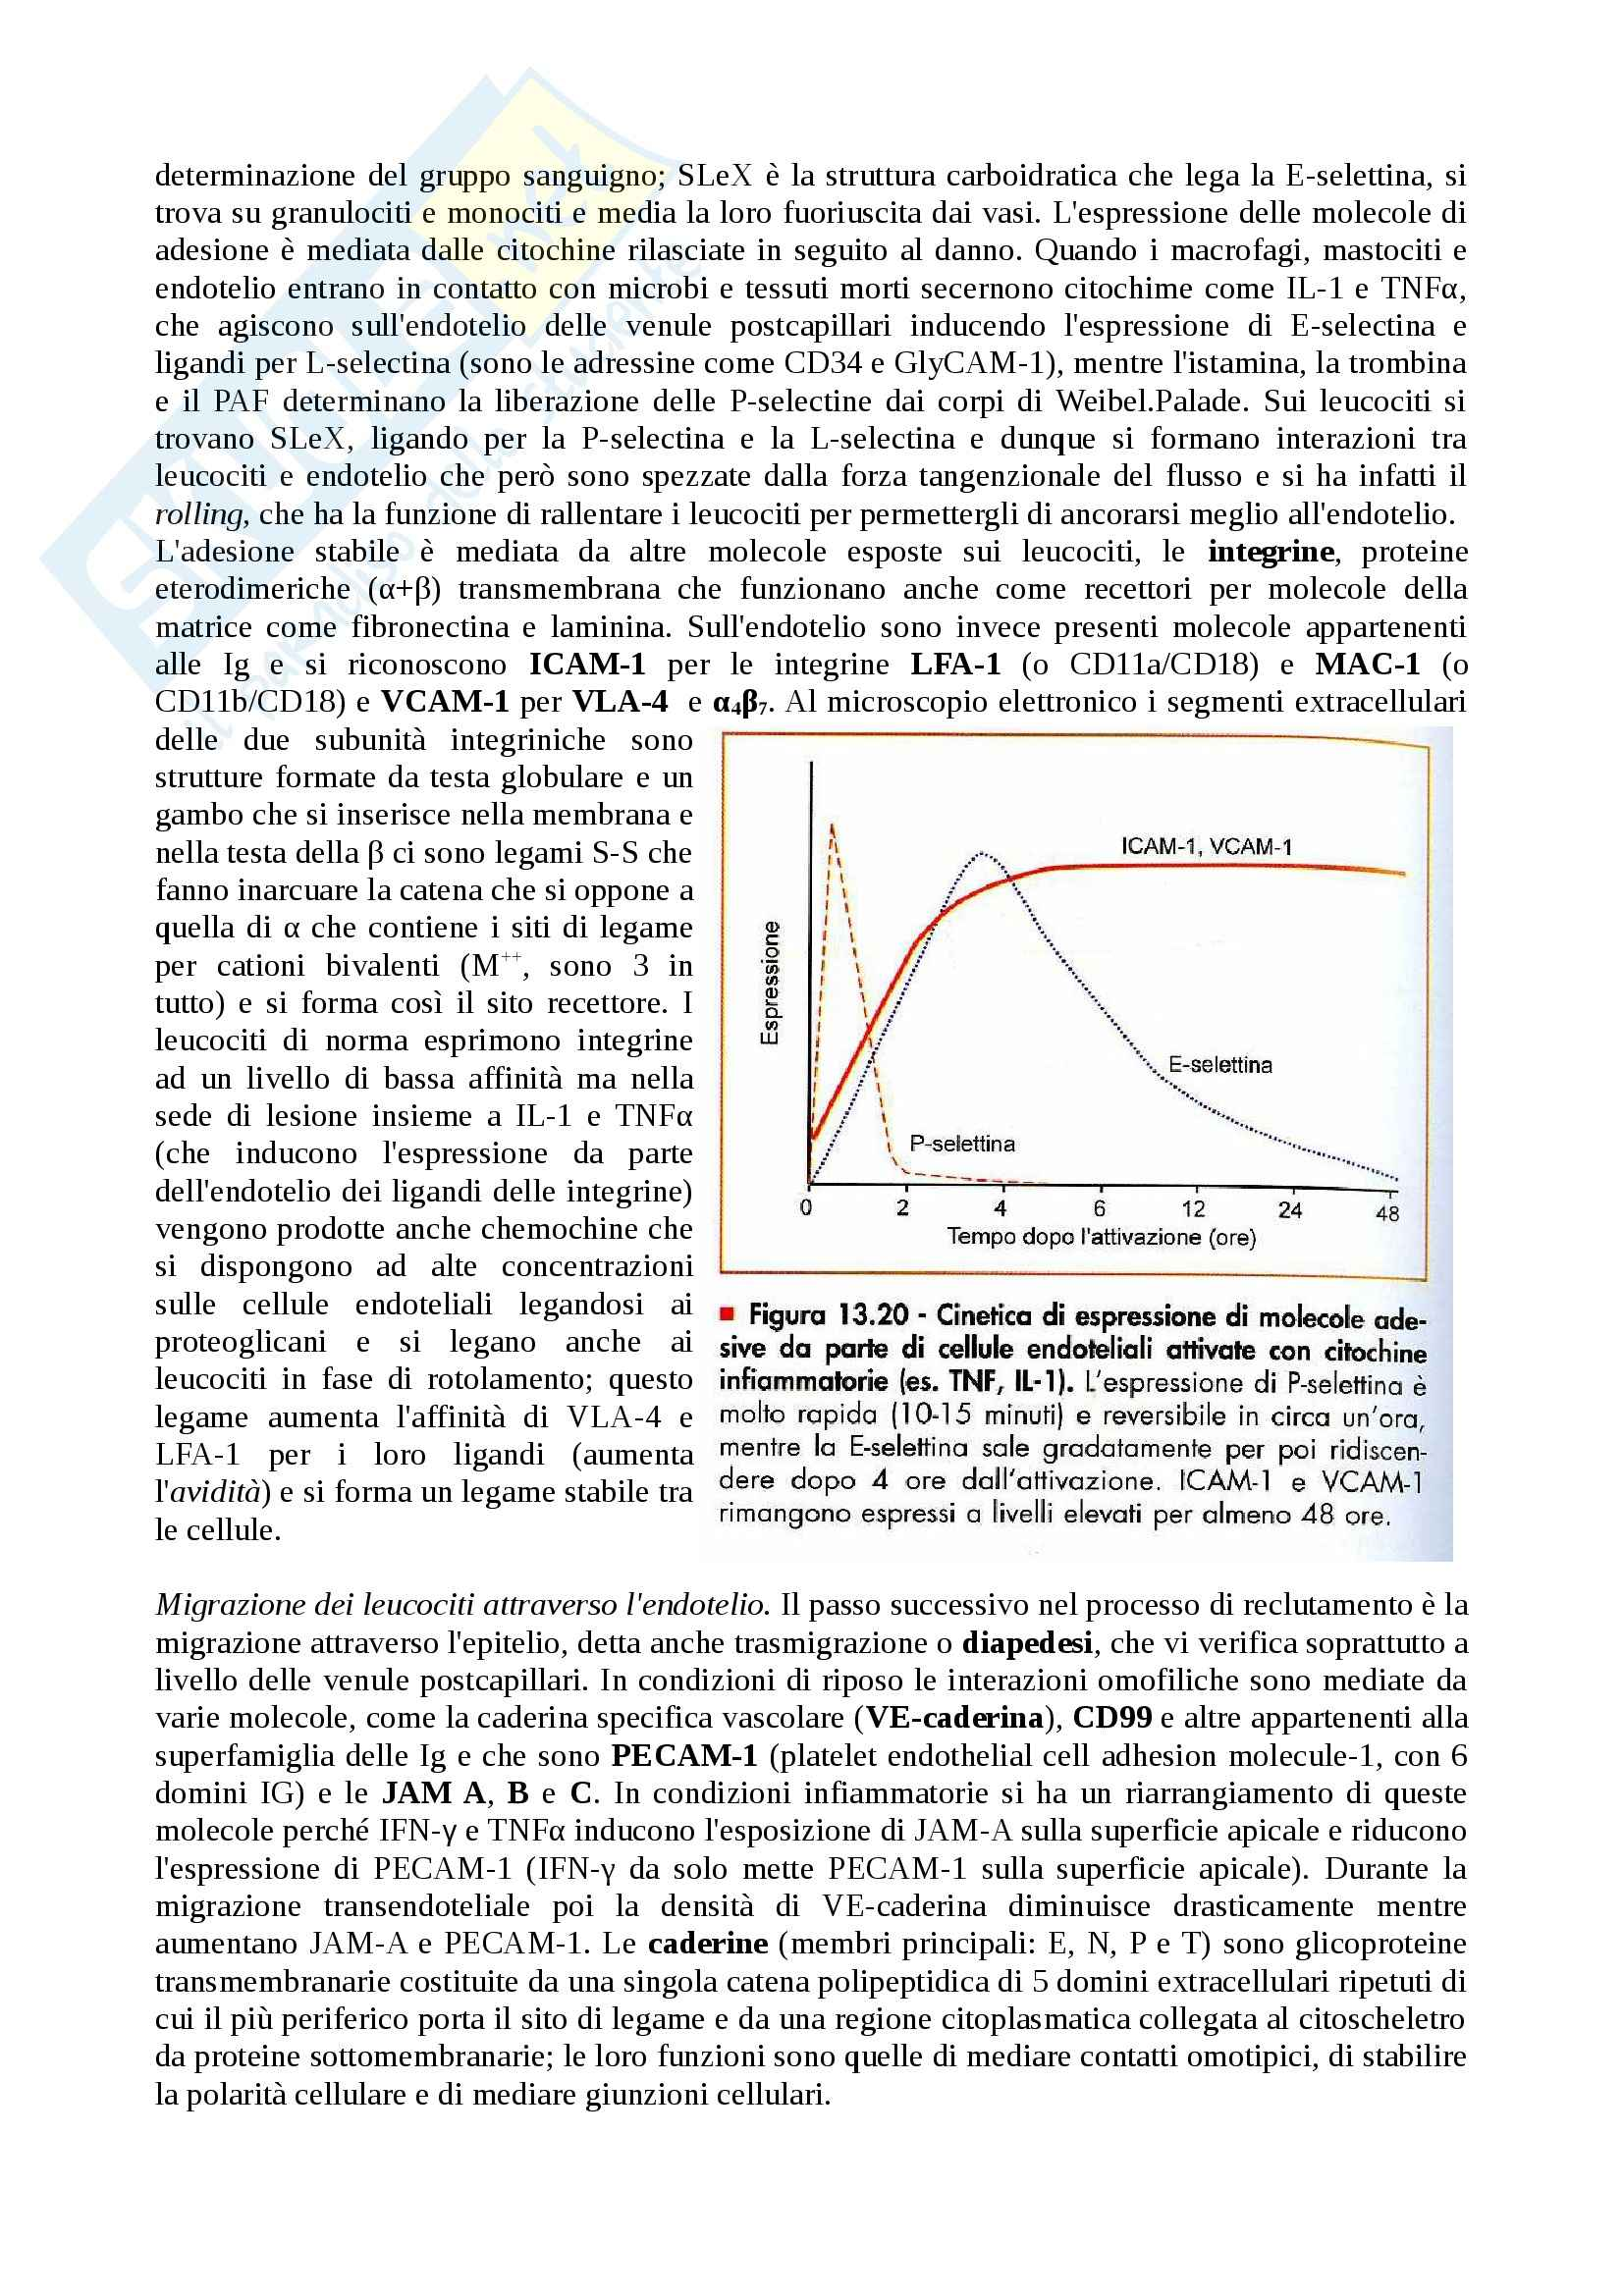 Patologia generale I - infiammazione acuta e cronica Pag. 6